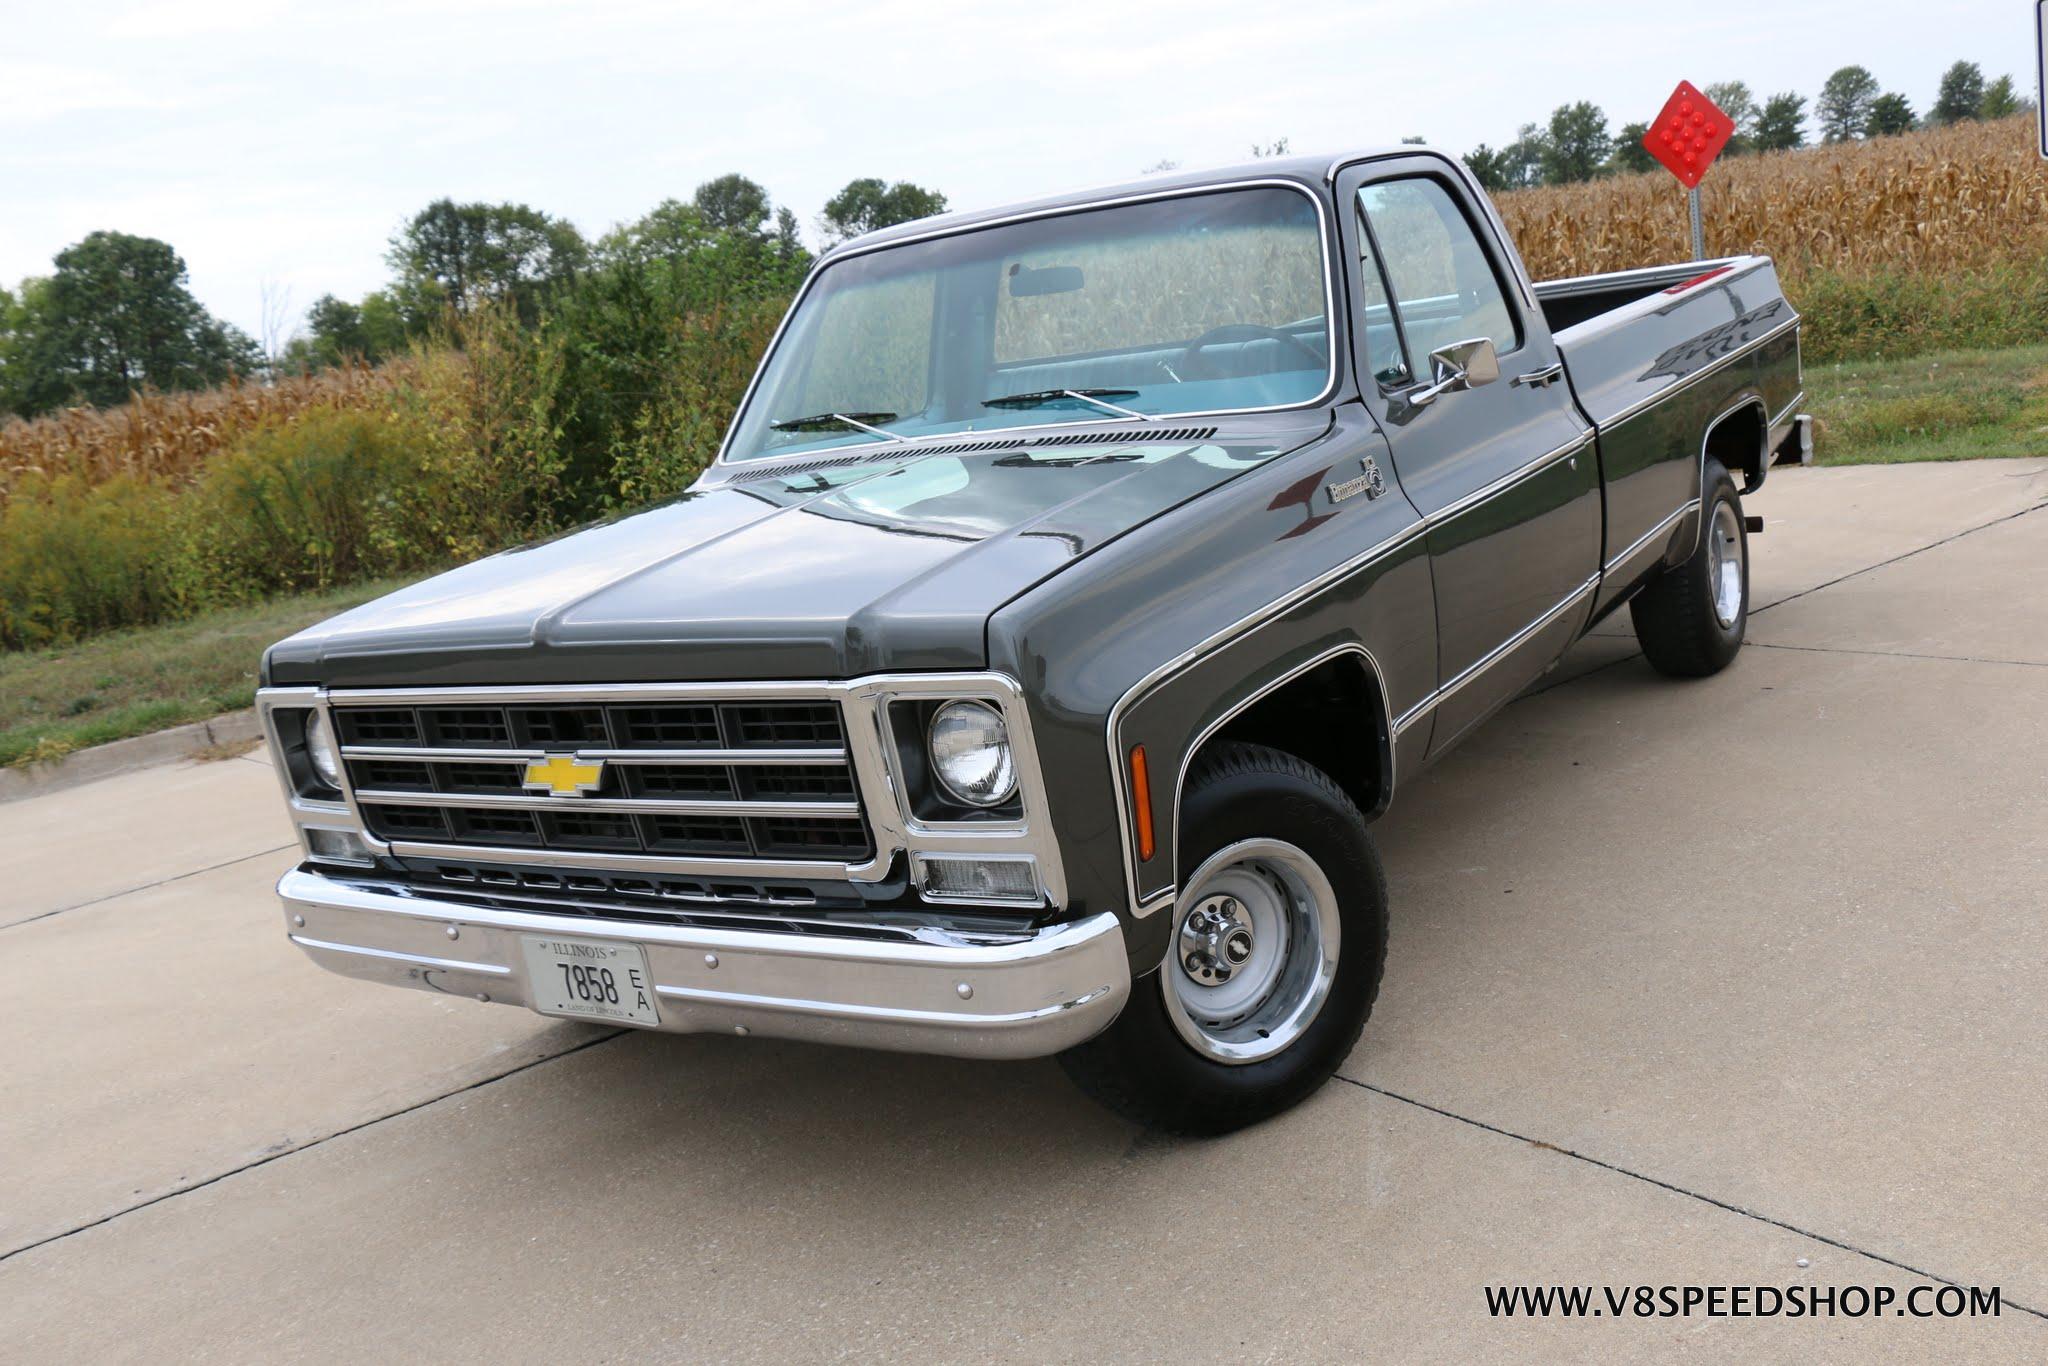 1979 Chevrolet Bonanza Pickup Restoration At V8 Speed & Resto Shop